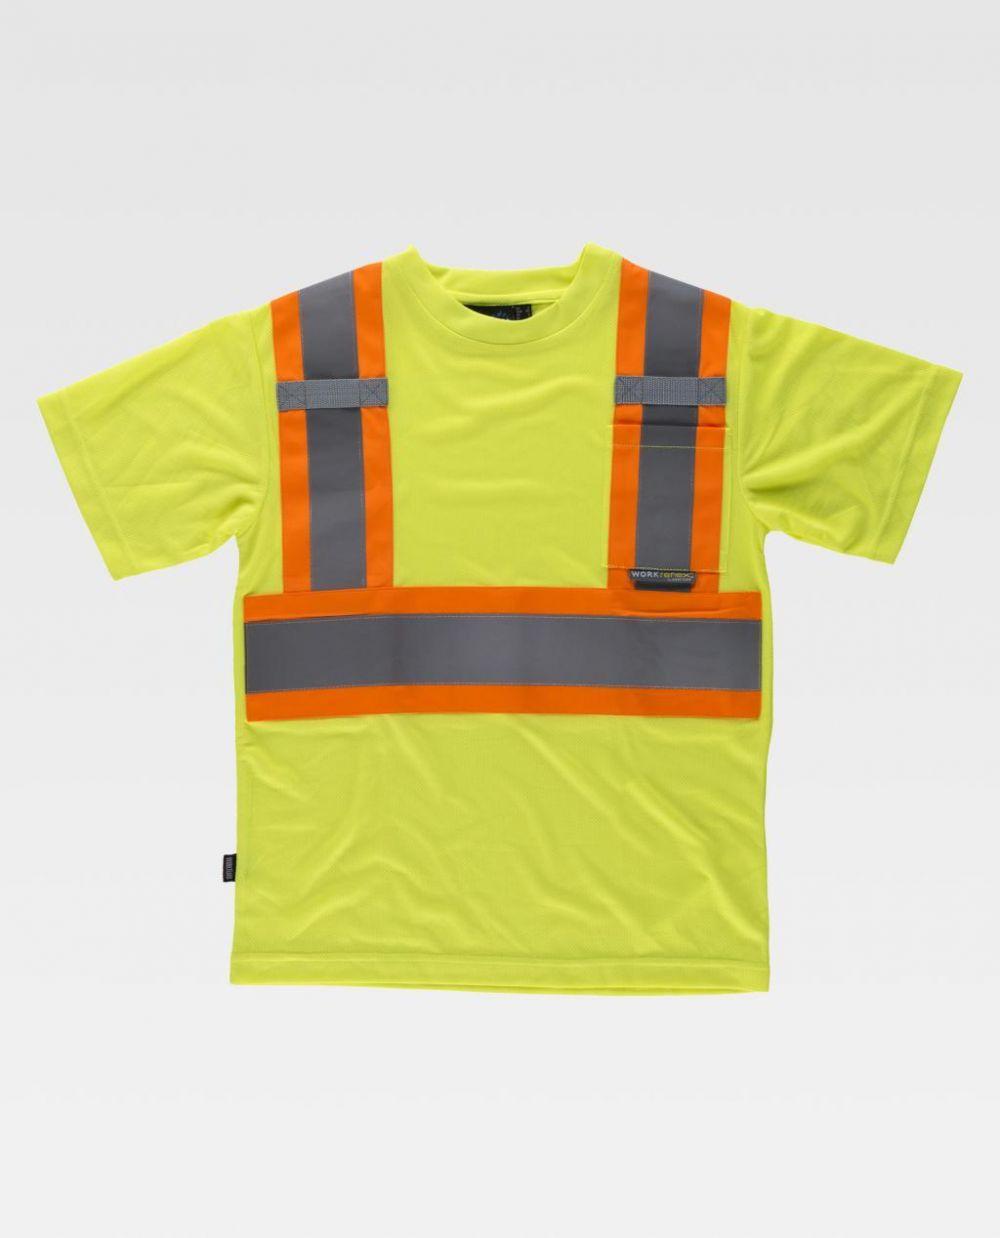 Camisetas reflectante workteam reflectante fluorescente mc de poliéster vista 1